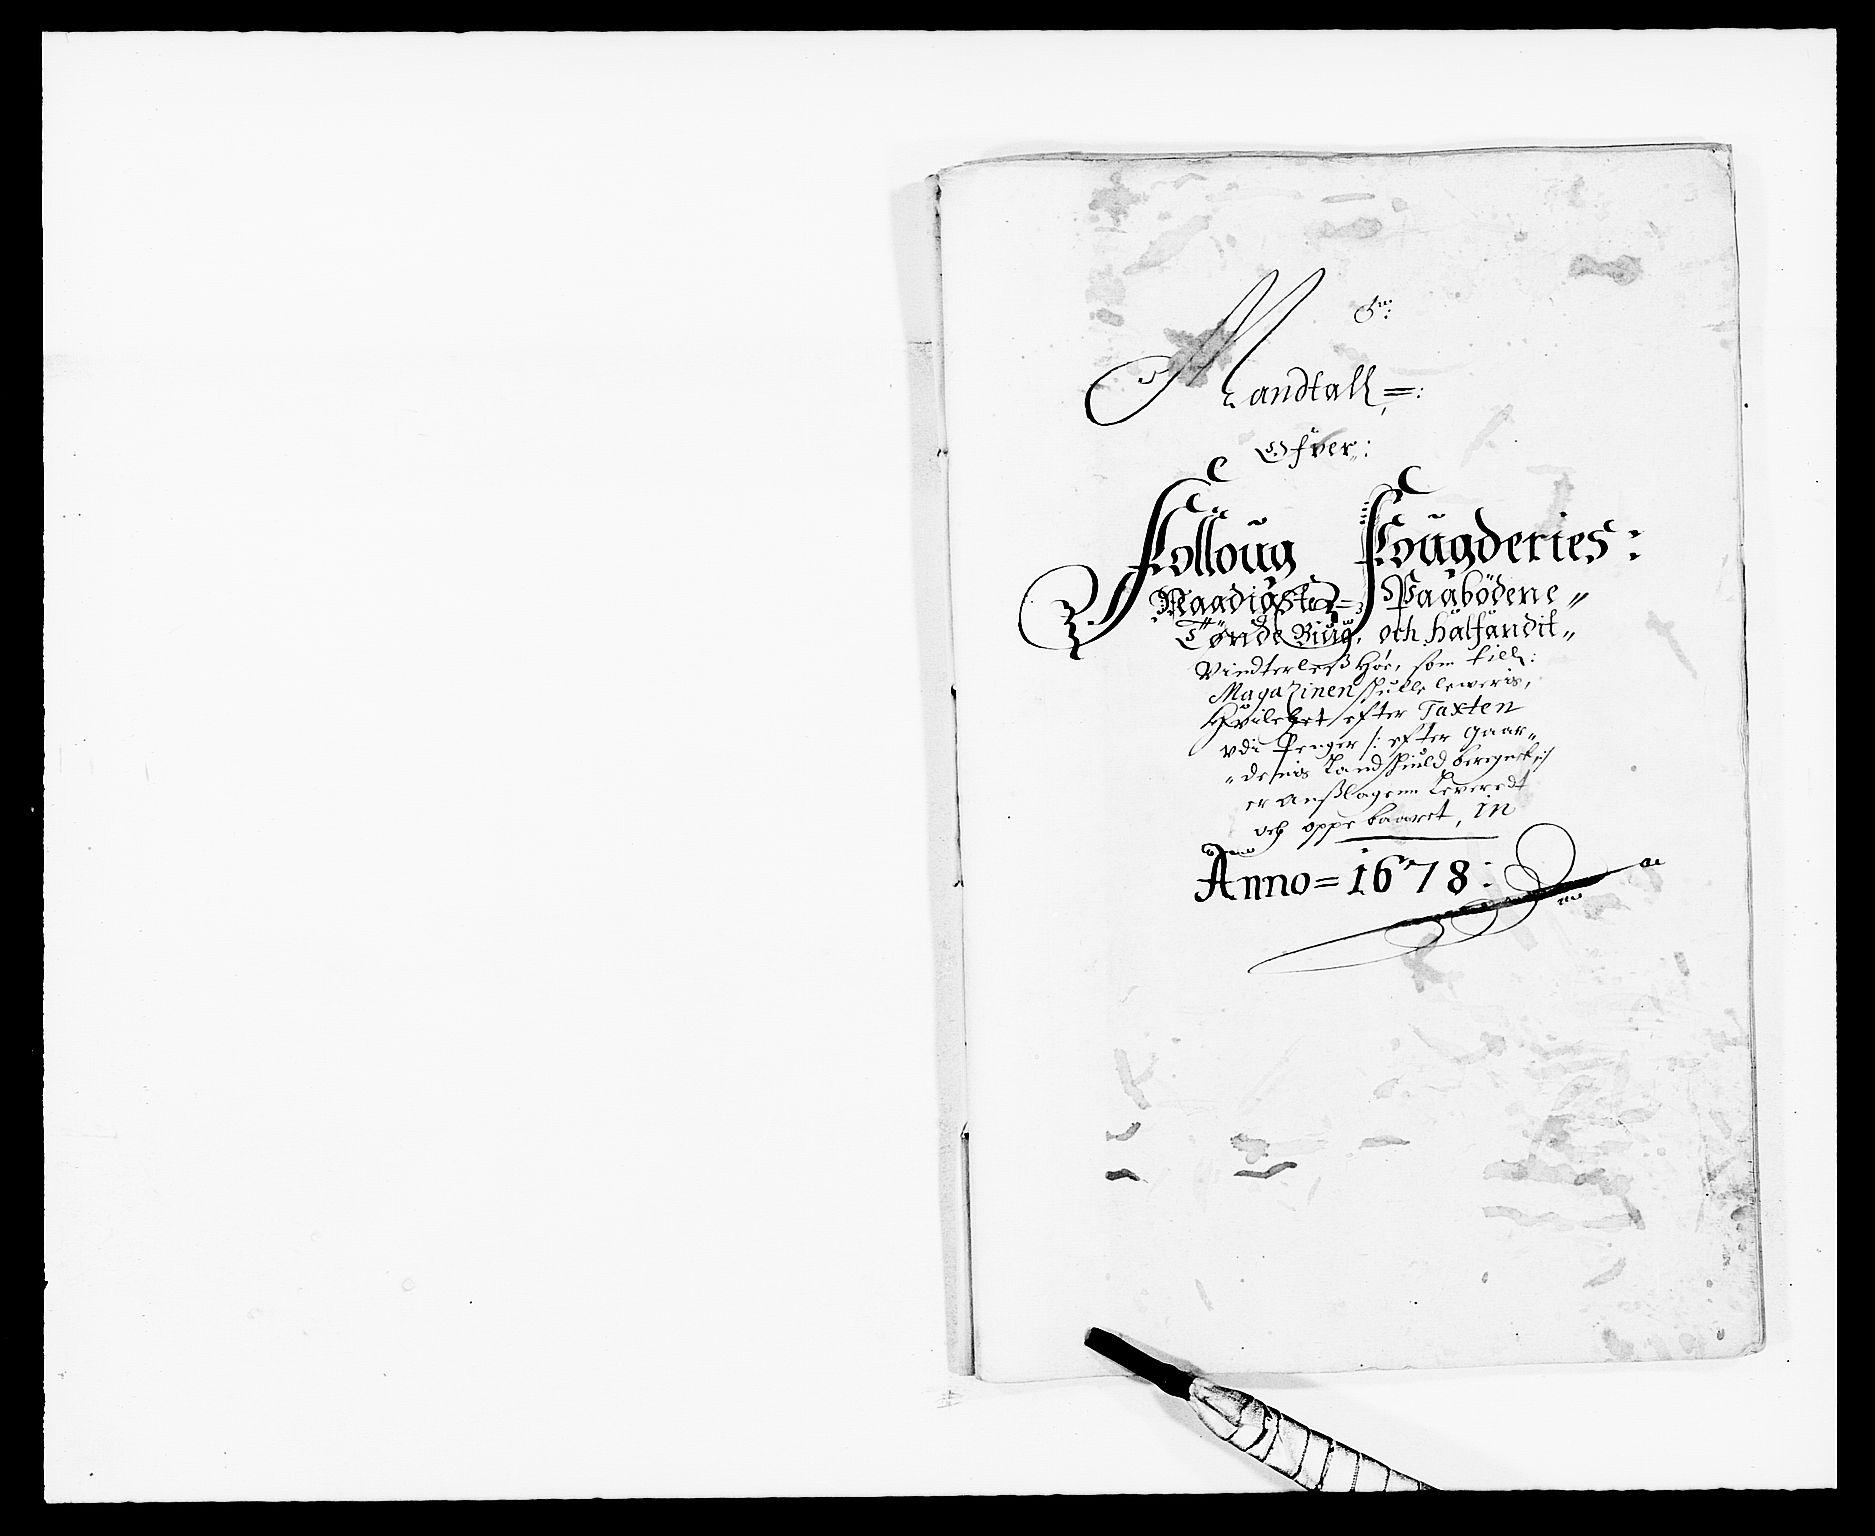 RA, Rentekammeret inntil 1814, Reviderte regnskaper, Fogderegnskap, R09/L0427: Fogderegnskap Follo, 1678, s. 194